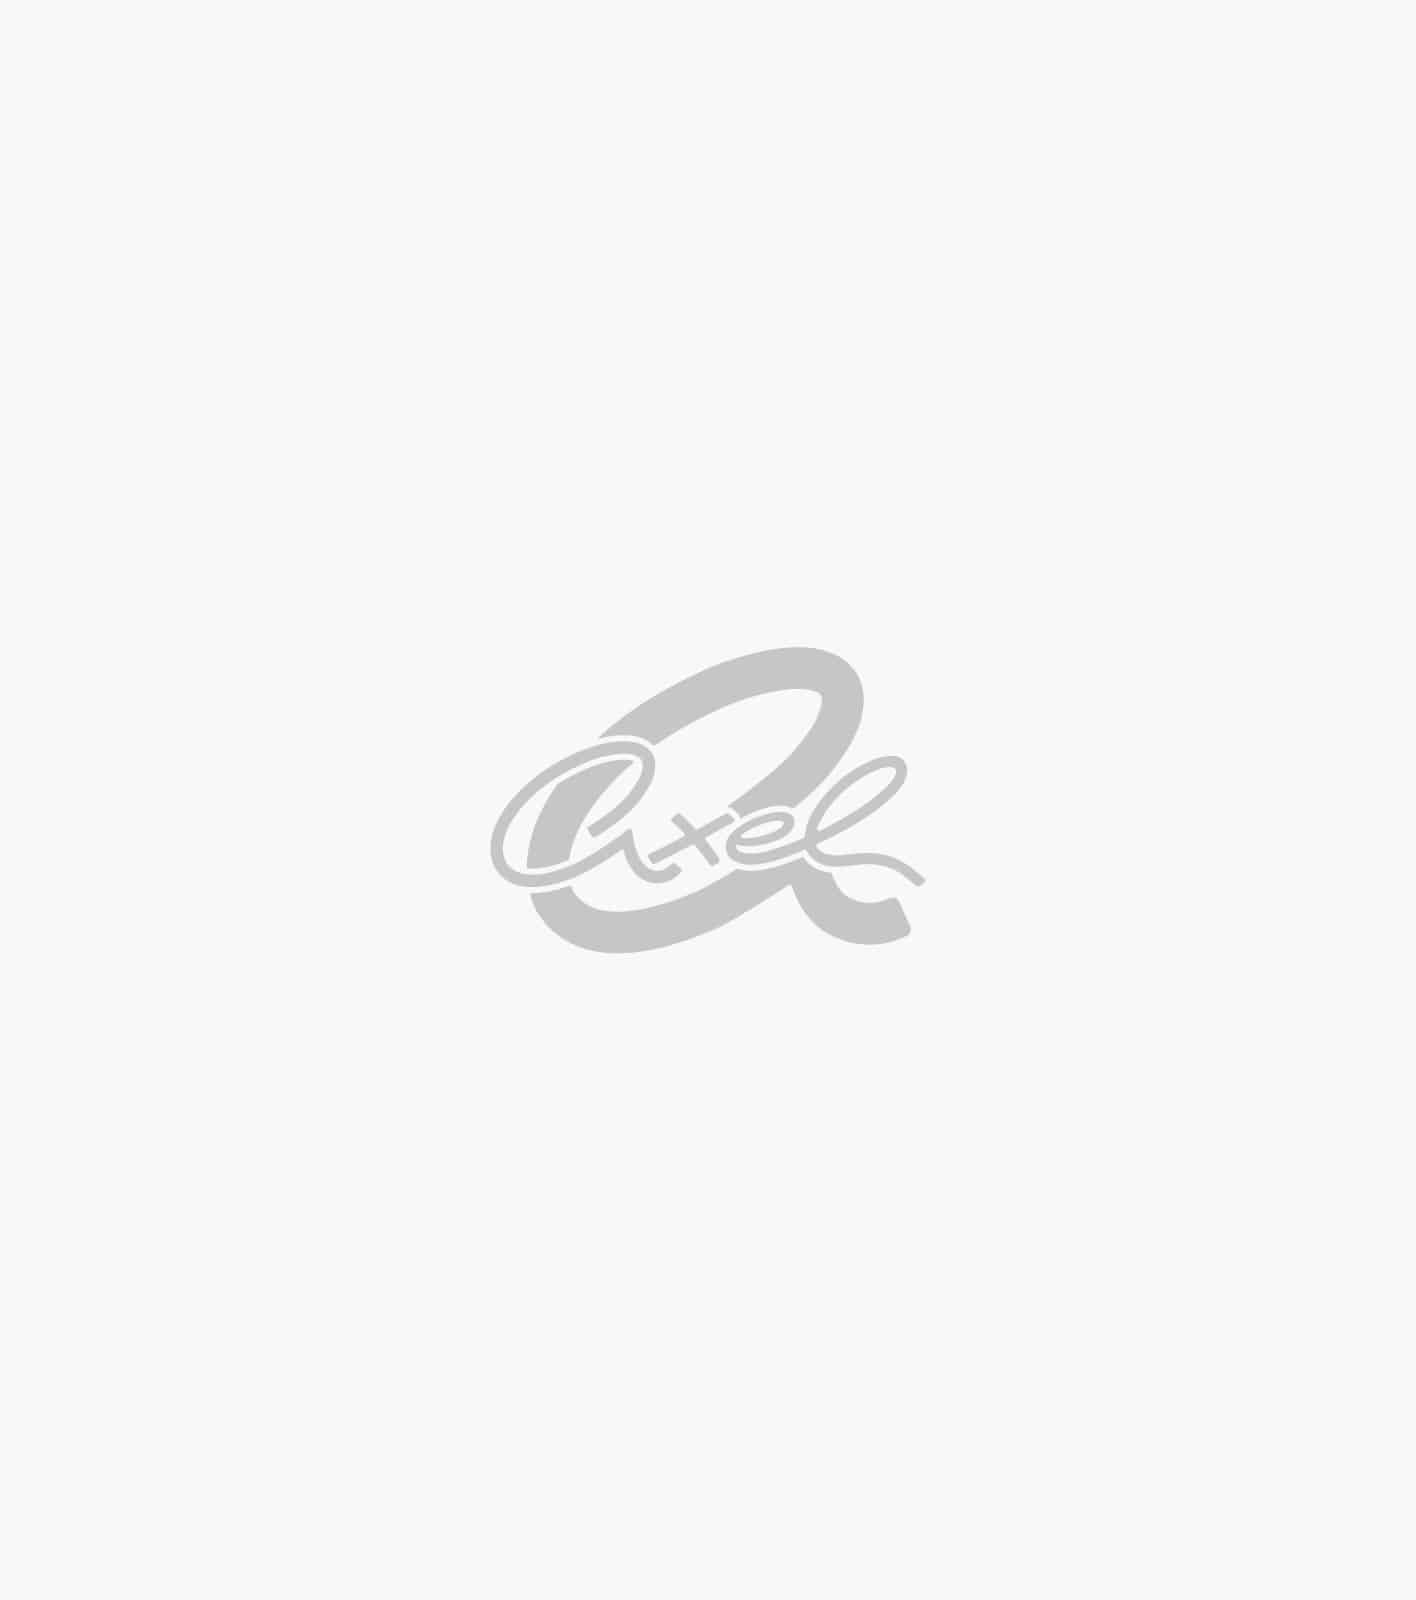 bc3979a197e Φορεματα καλοκαιρινα Axel online